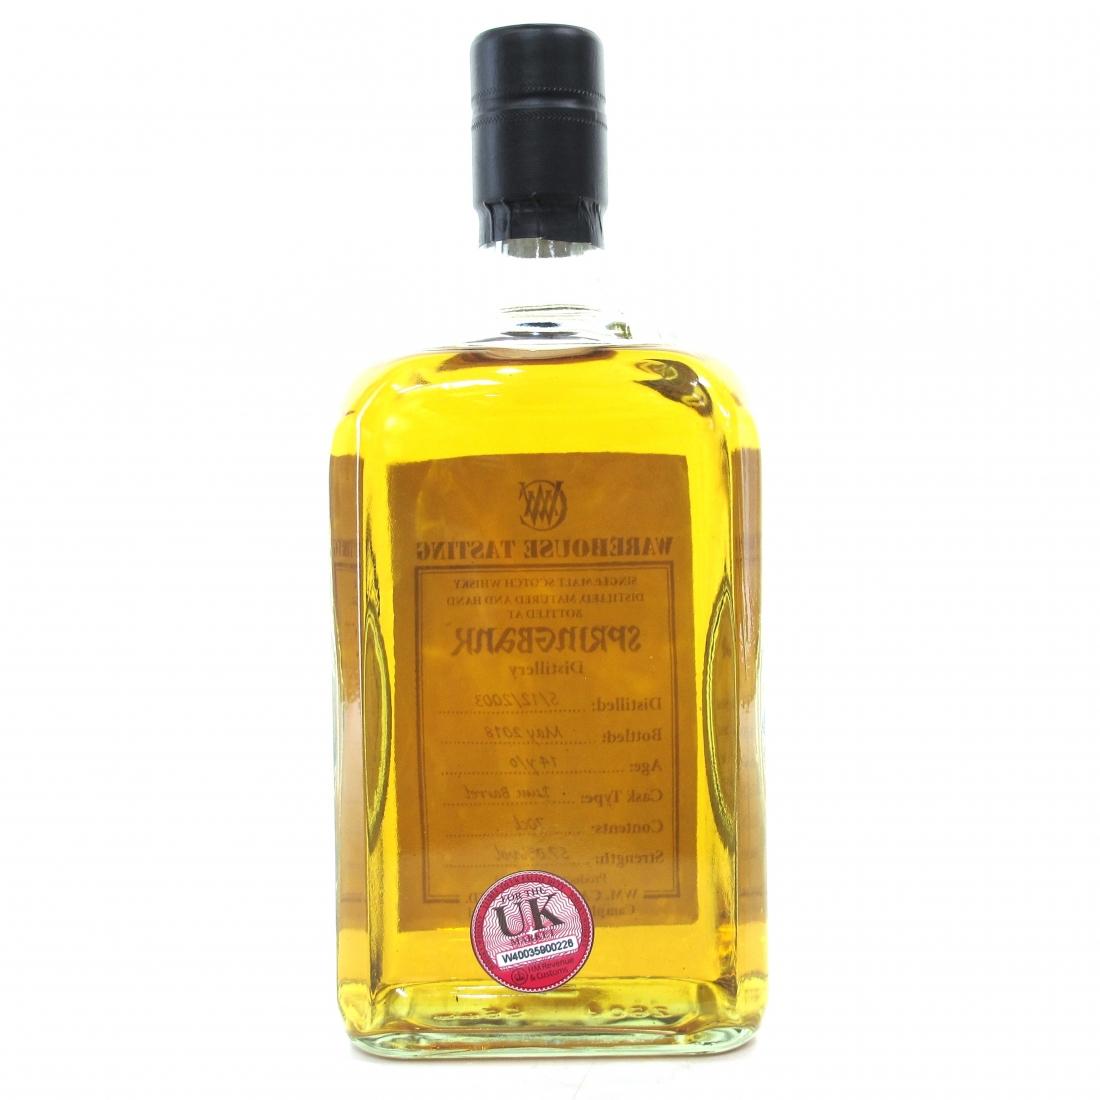 Springbank 2003 Rum Barrel 14 Year Old / Warehouse Tasting